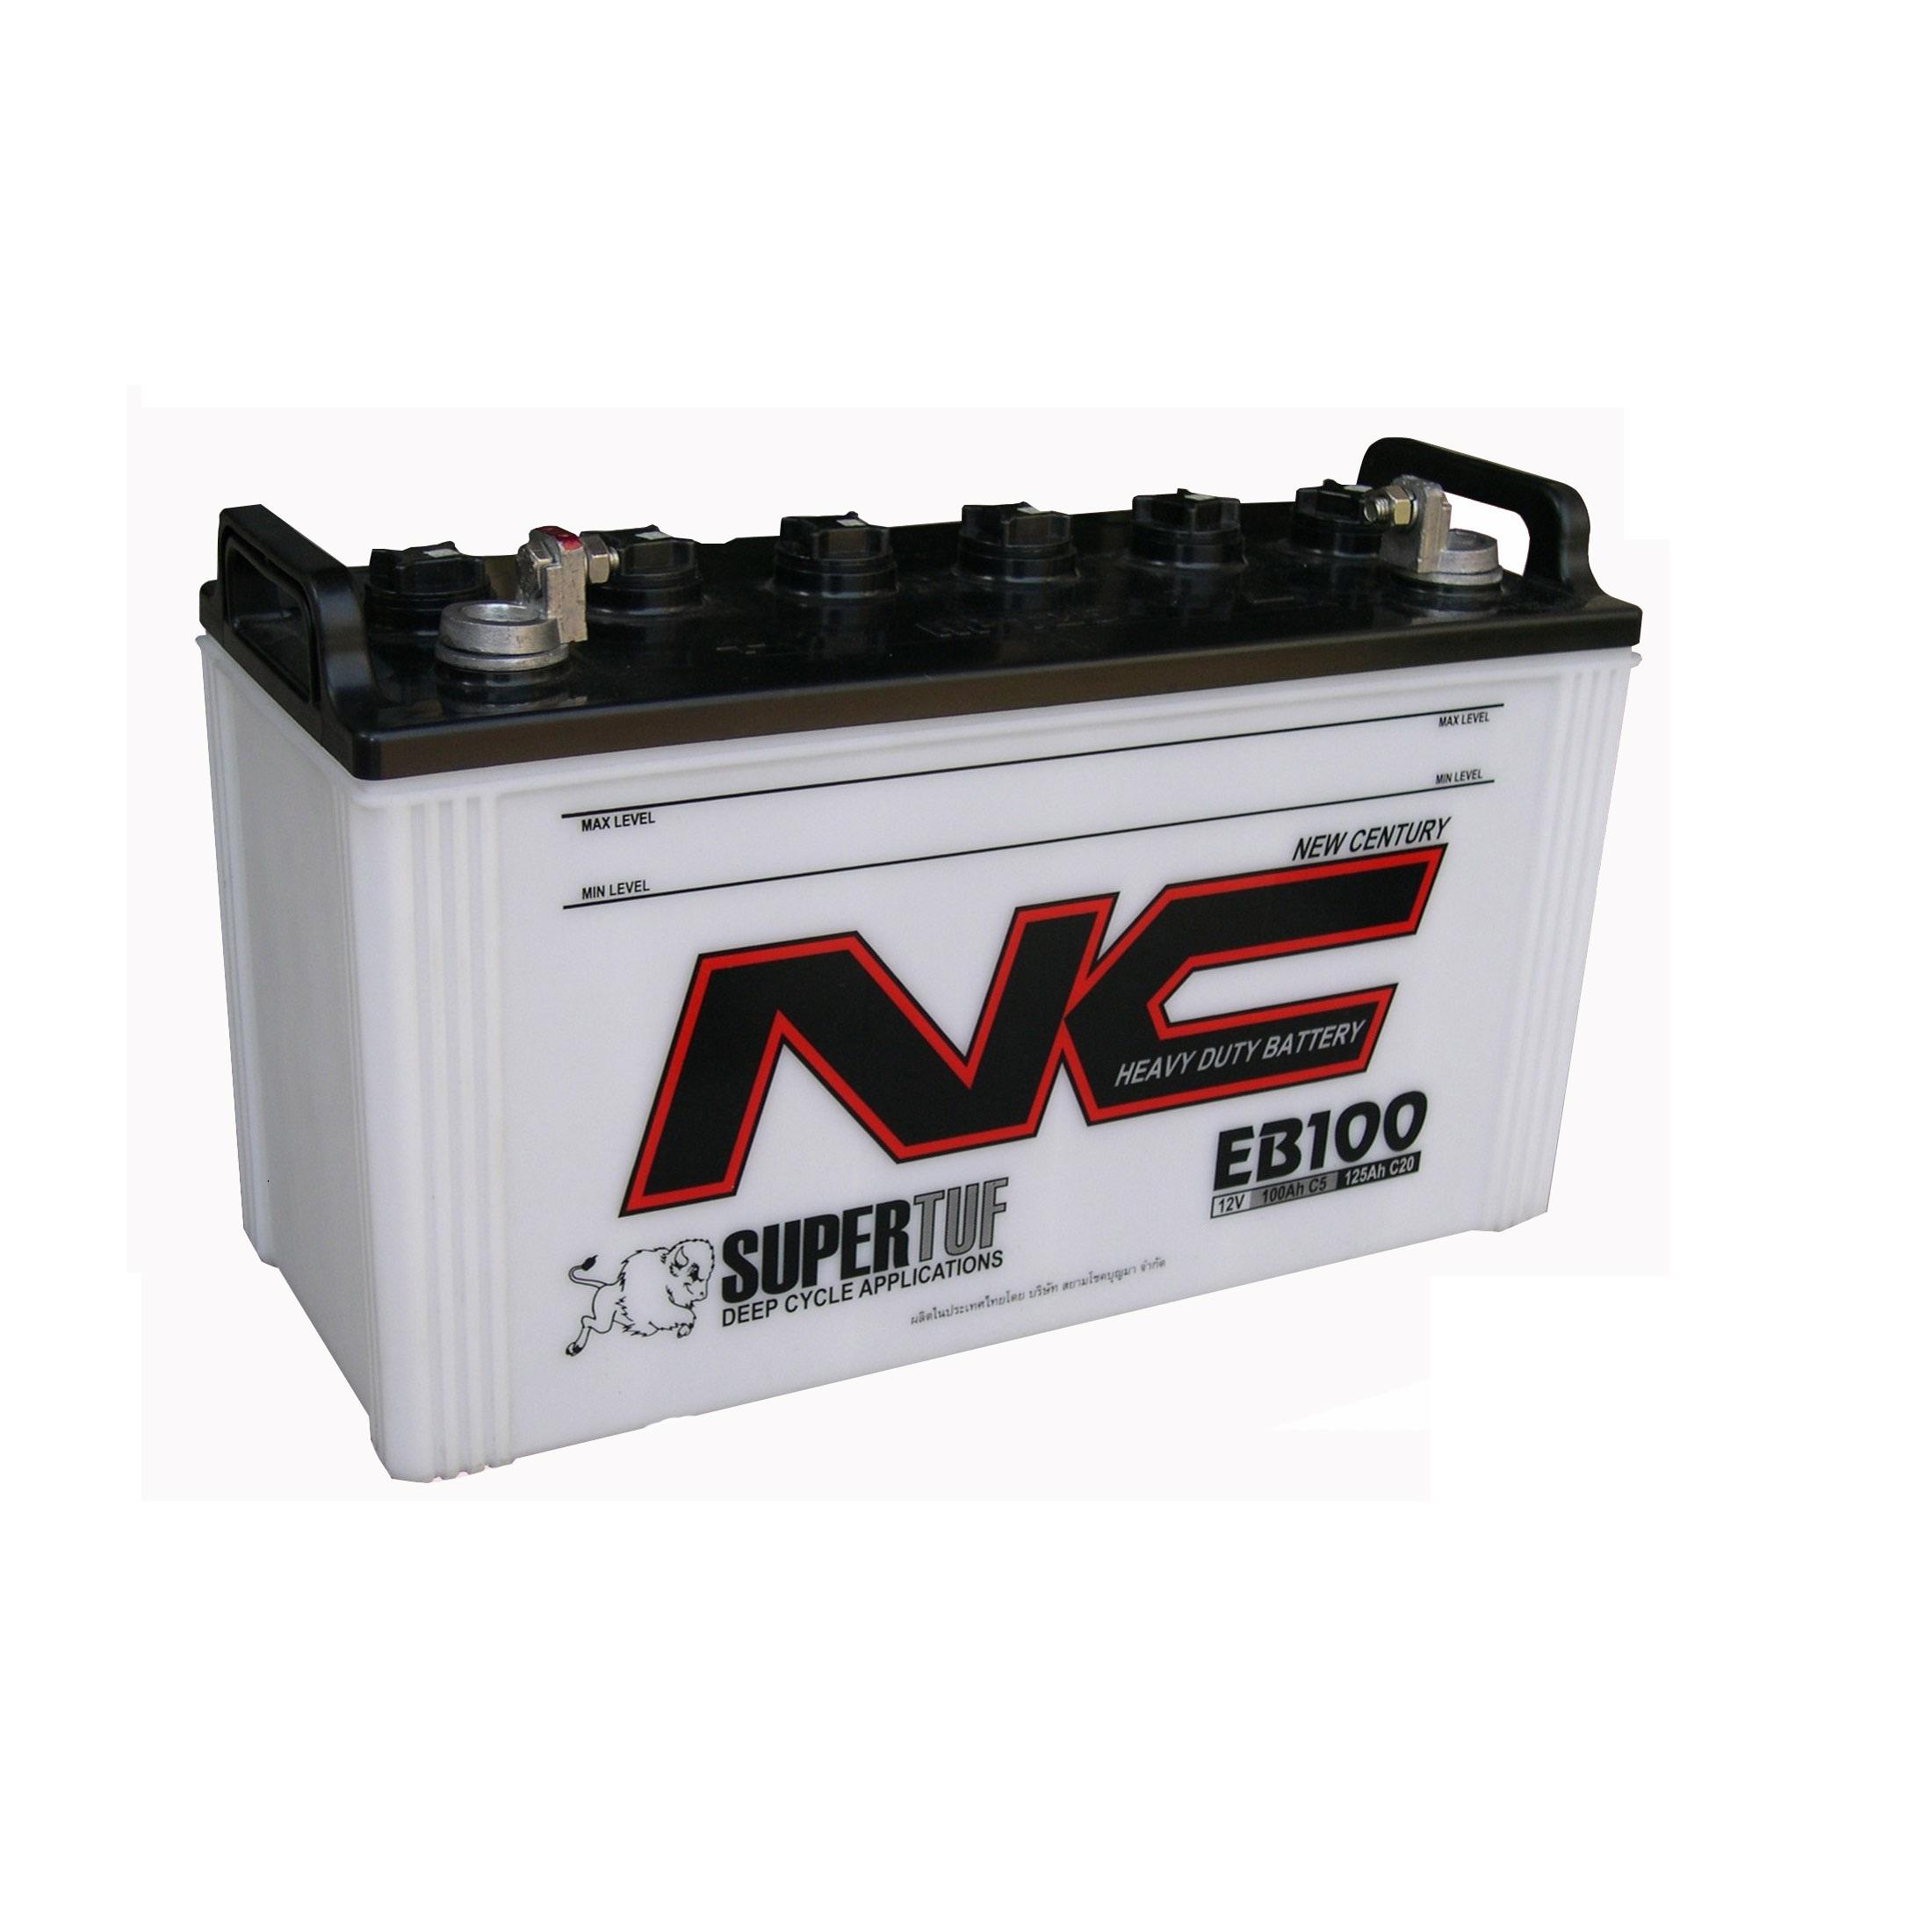 Battery Deep cycle 130Ah (NC)